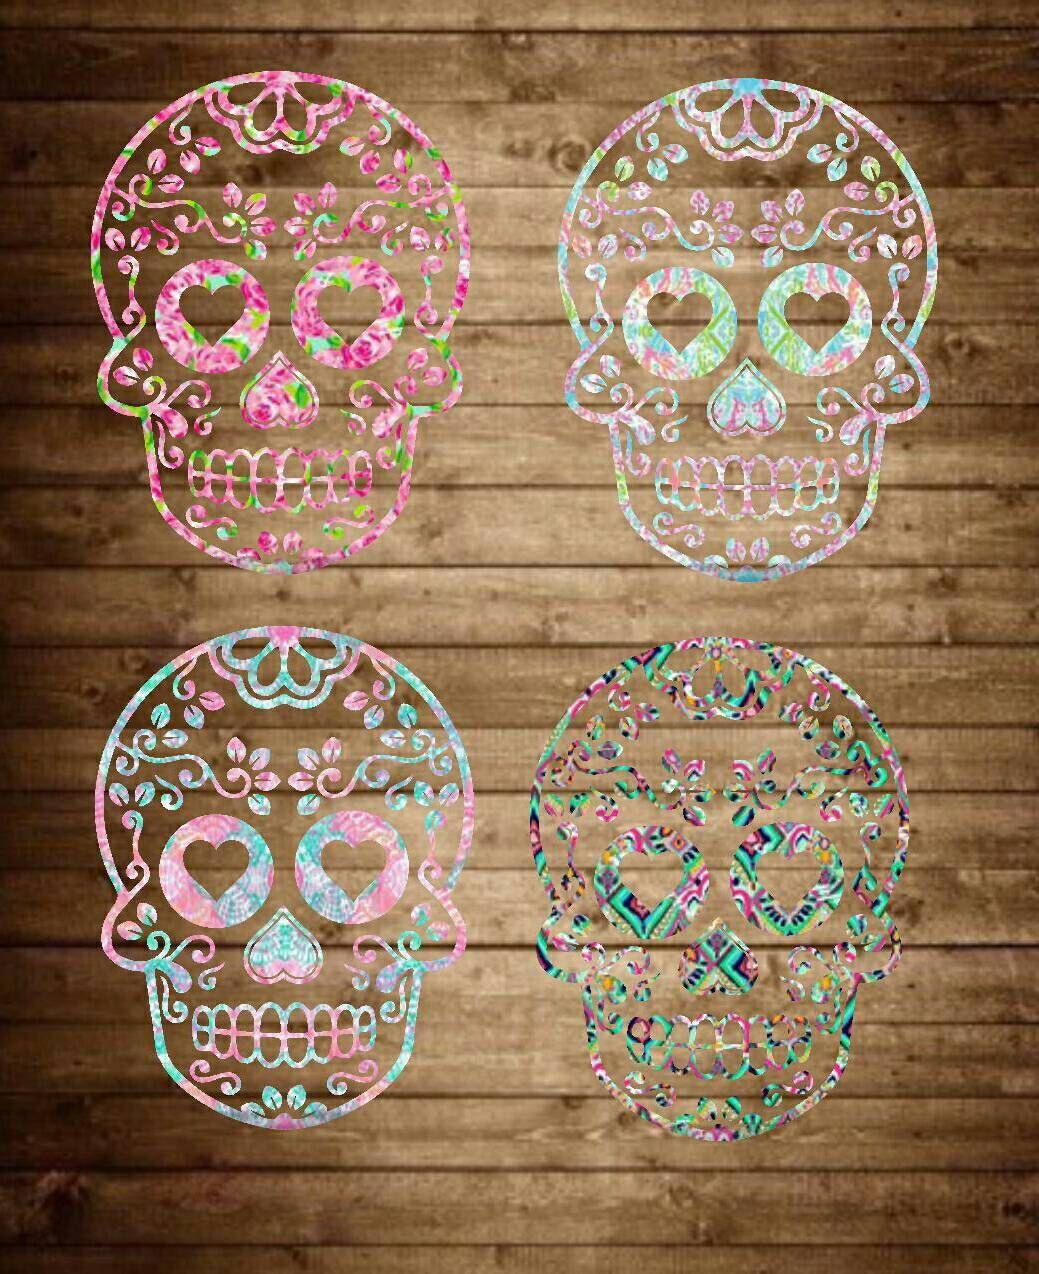 Sugar Skull Decal Lilly Pulitzer Inspired Decal Sugar Skull - Sugar skull yeti cup